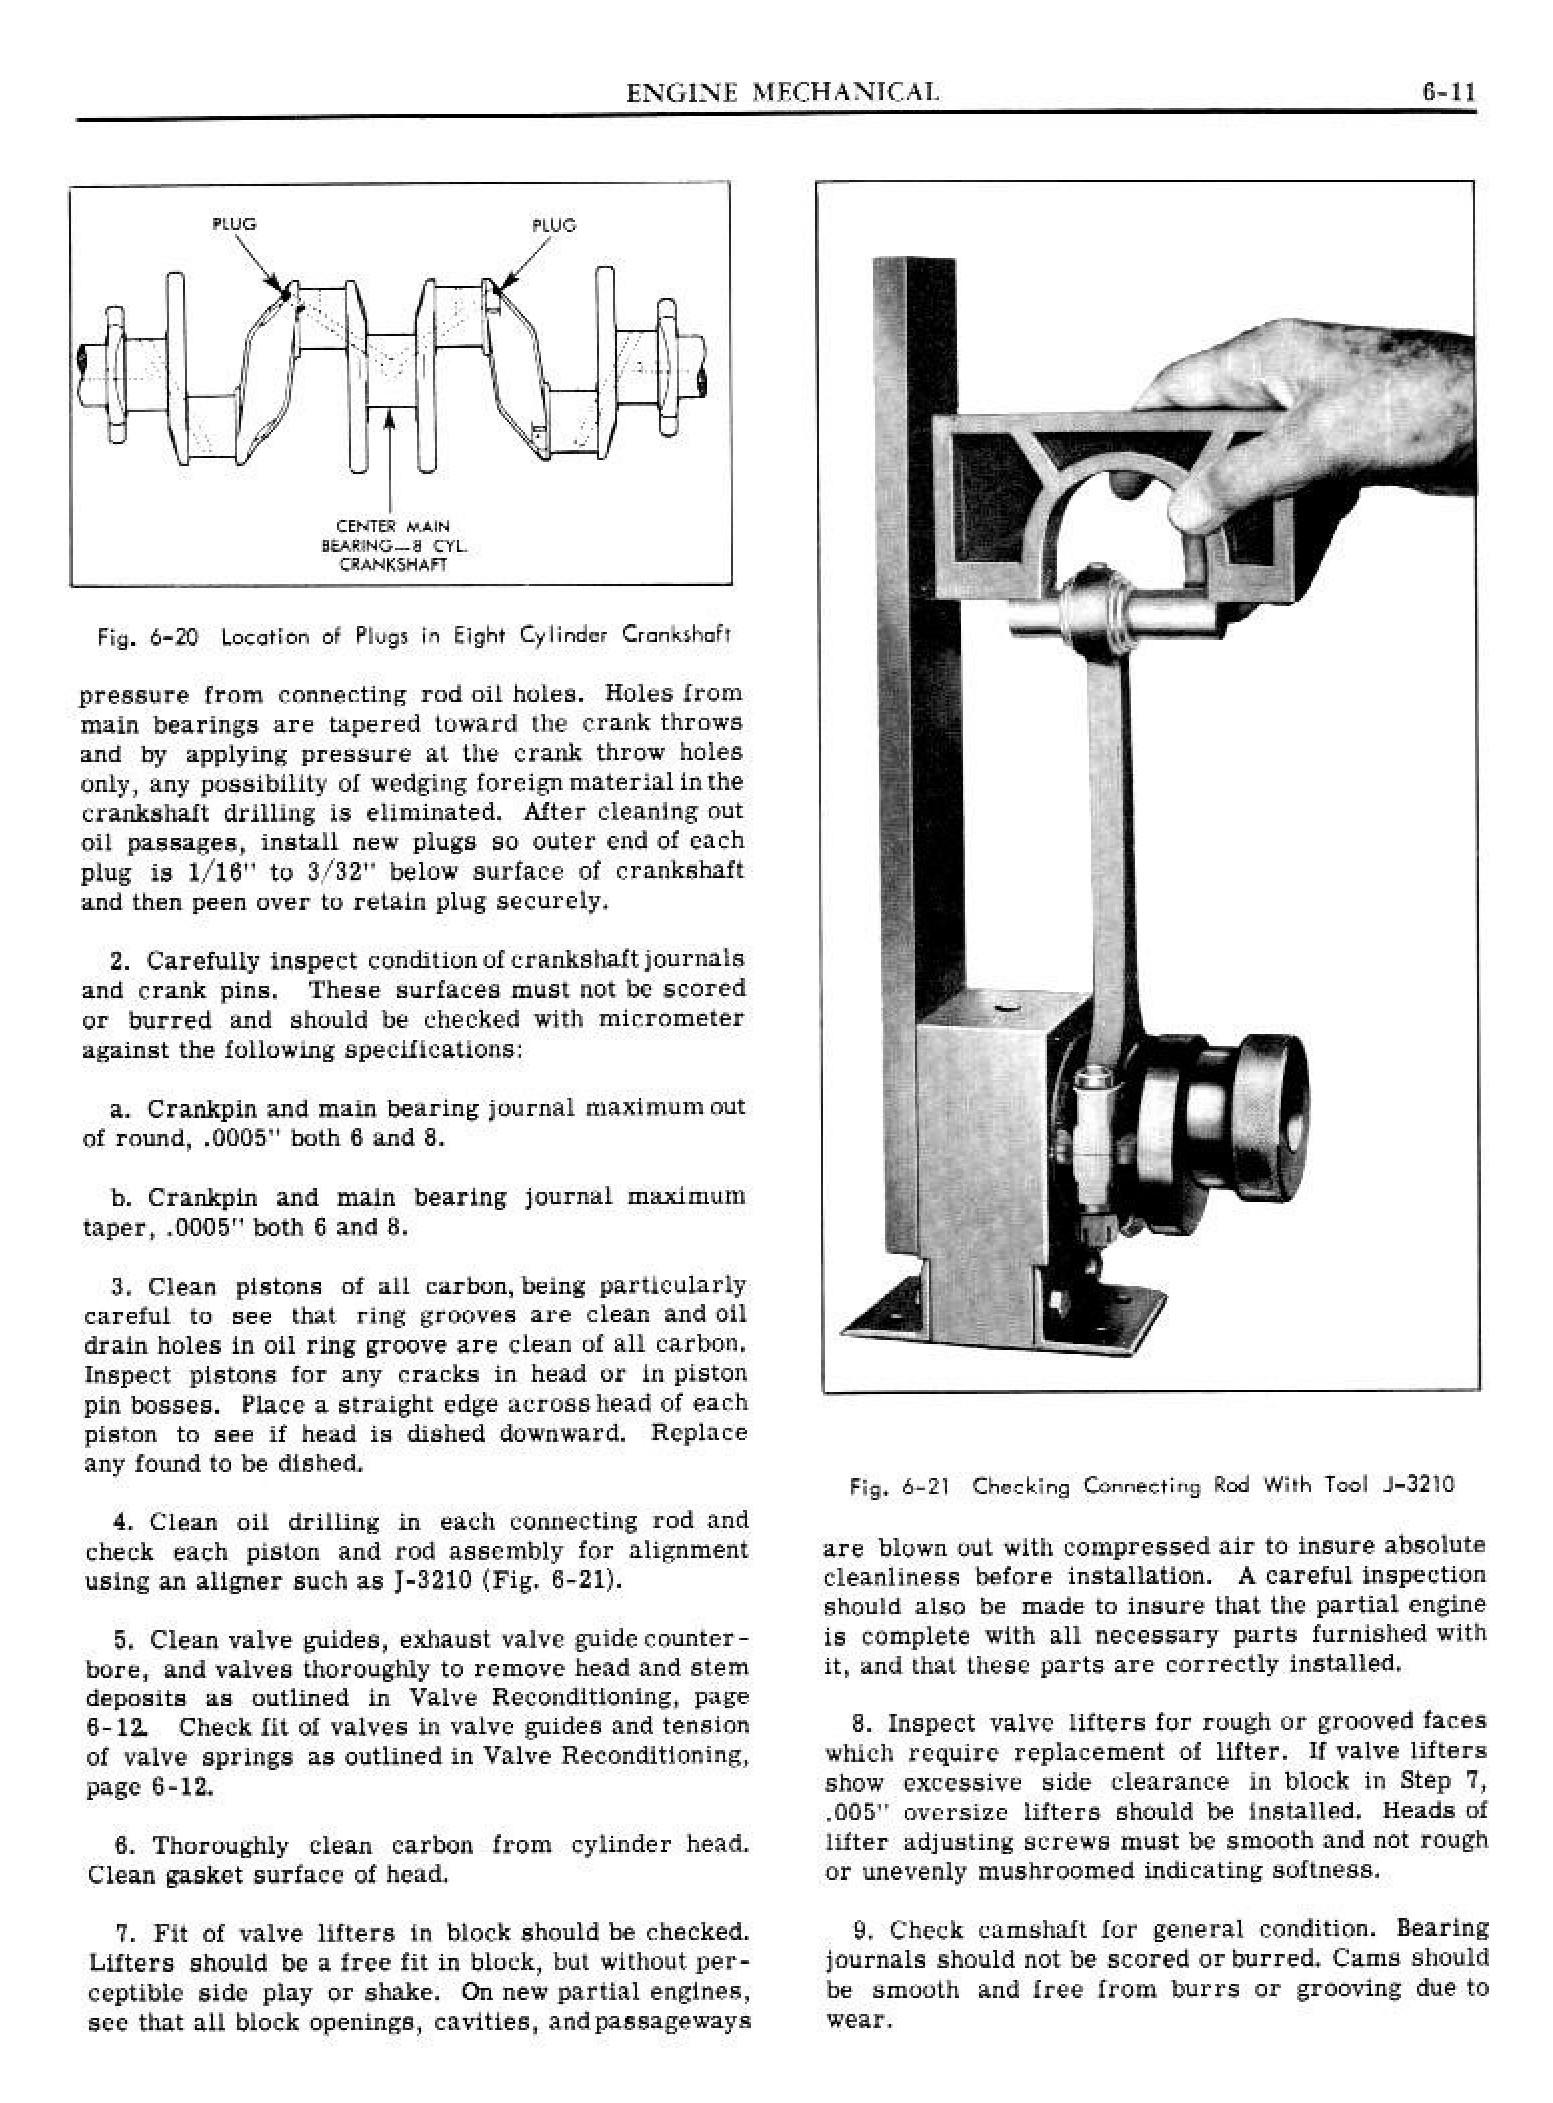 1949 Pontiac Shop Manual- Engine Mechanical Page 11 of 26